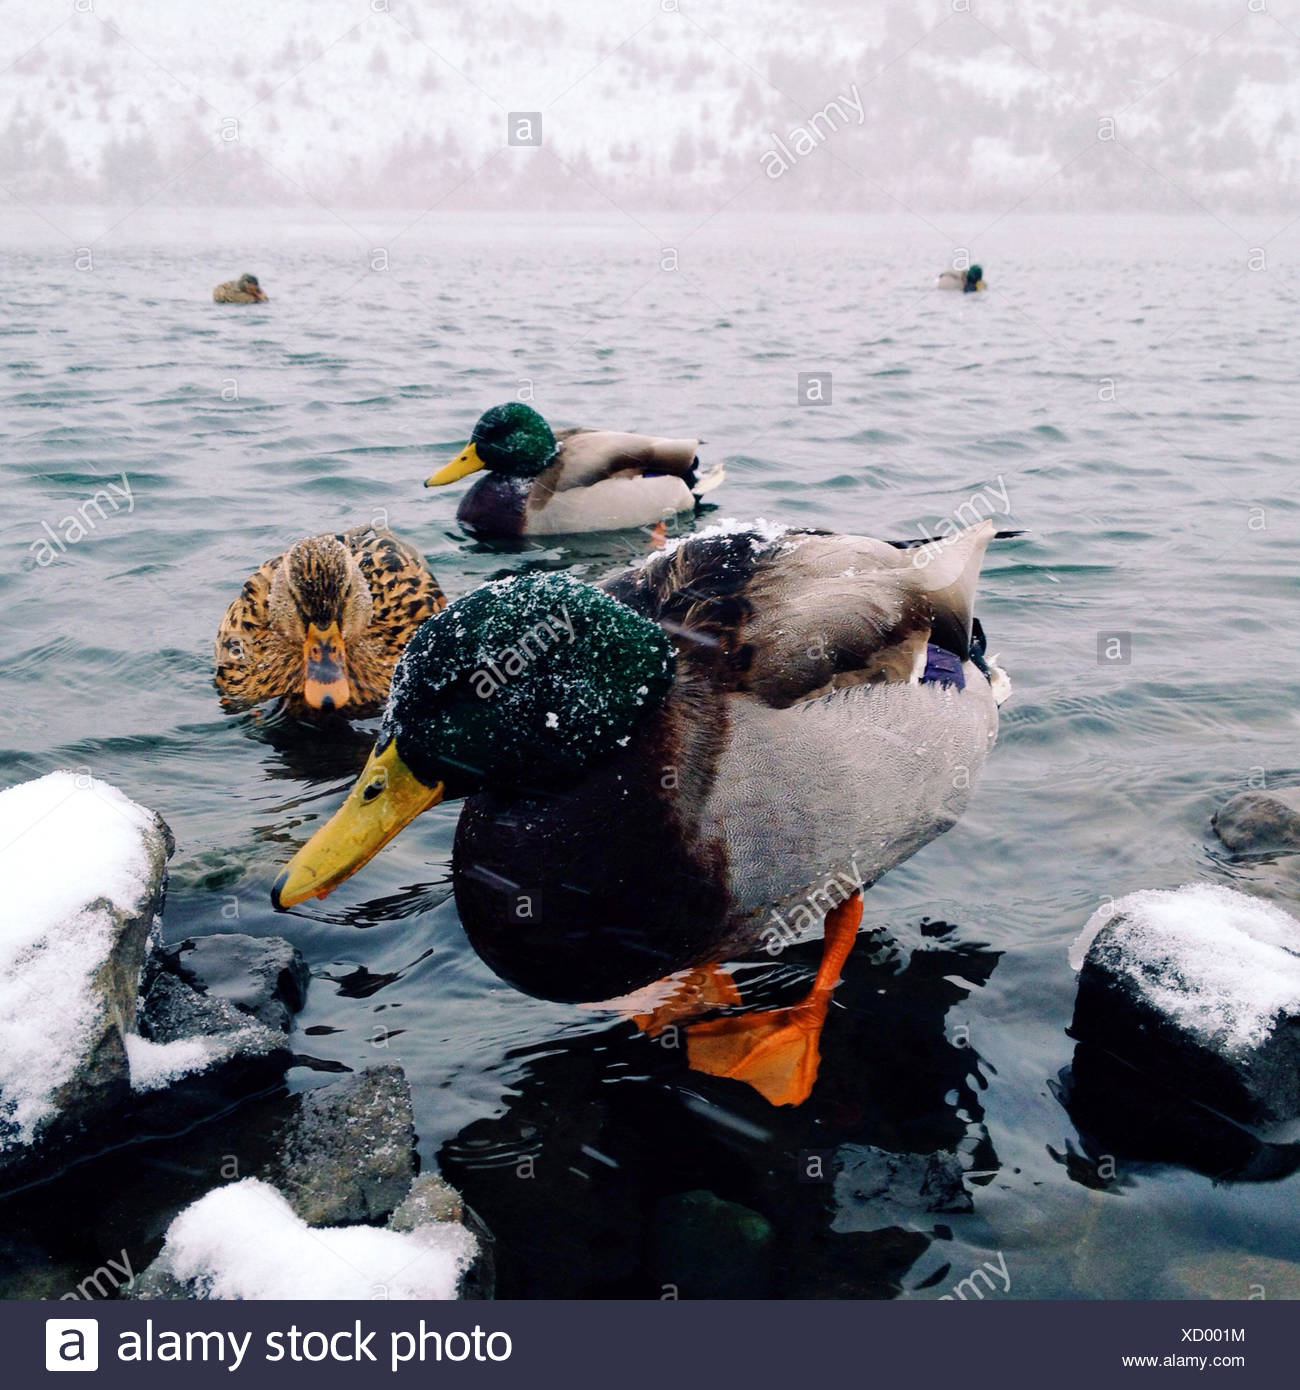 USA, Oregon, Washington County, Beaverton, ducks in winter - Stock Image